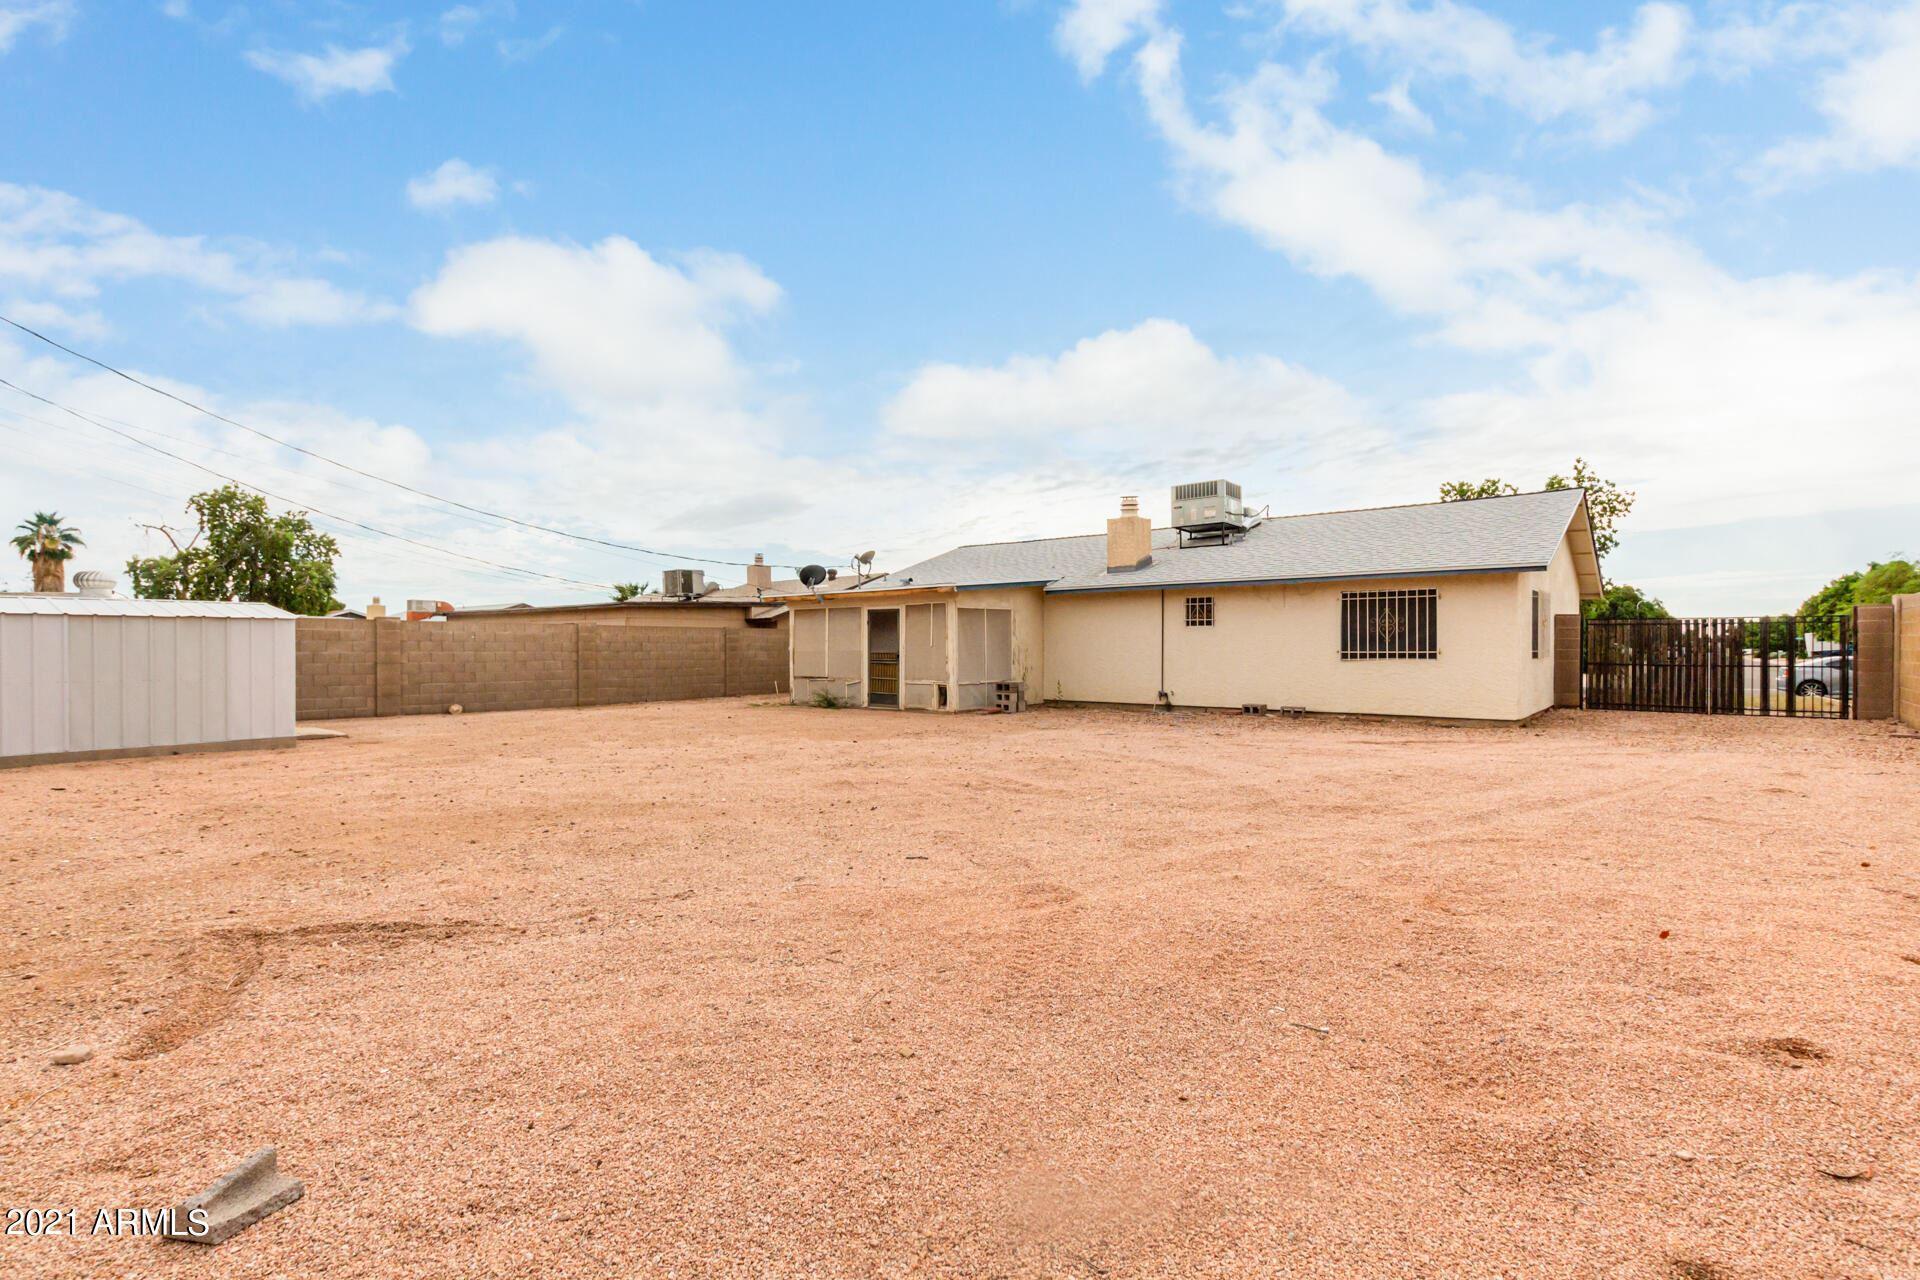 Photo of 1049 S MARA Drive, Apache Junction, AZ 85120 (MLS # 6304009)